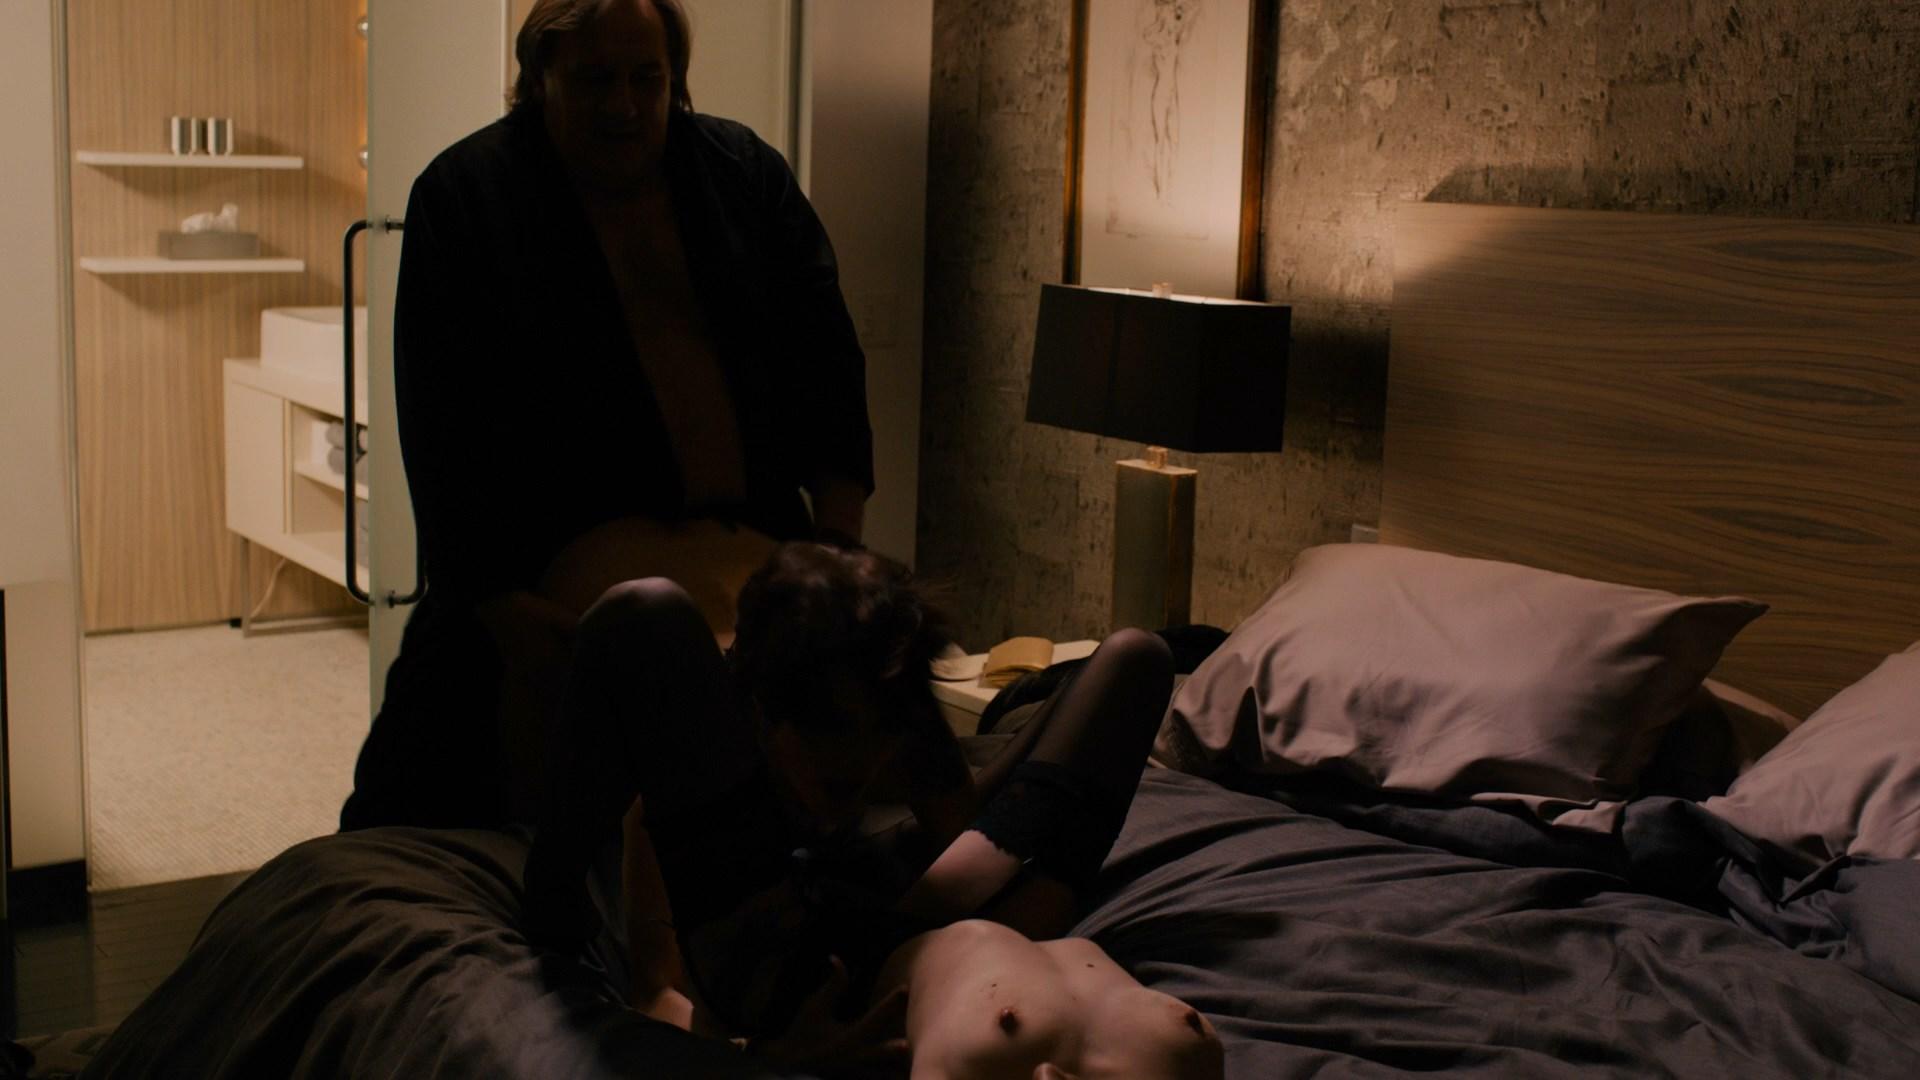 lesvianas-sex-scene-welcome-naked-schoolgirl-sex